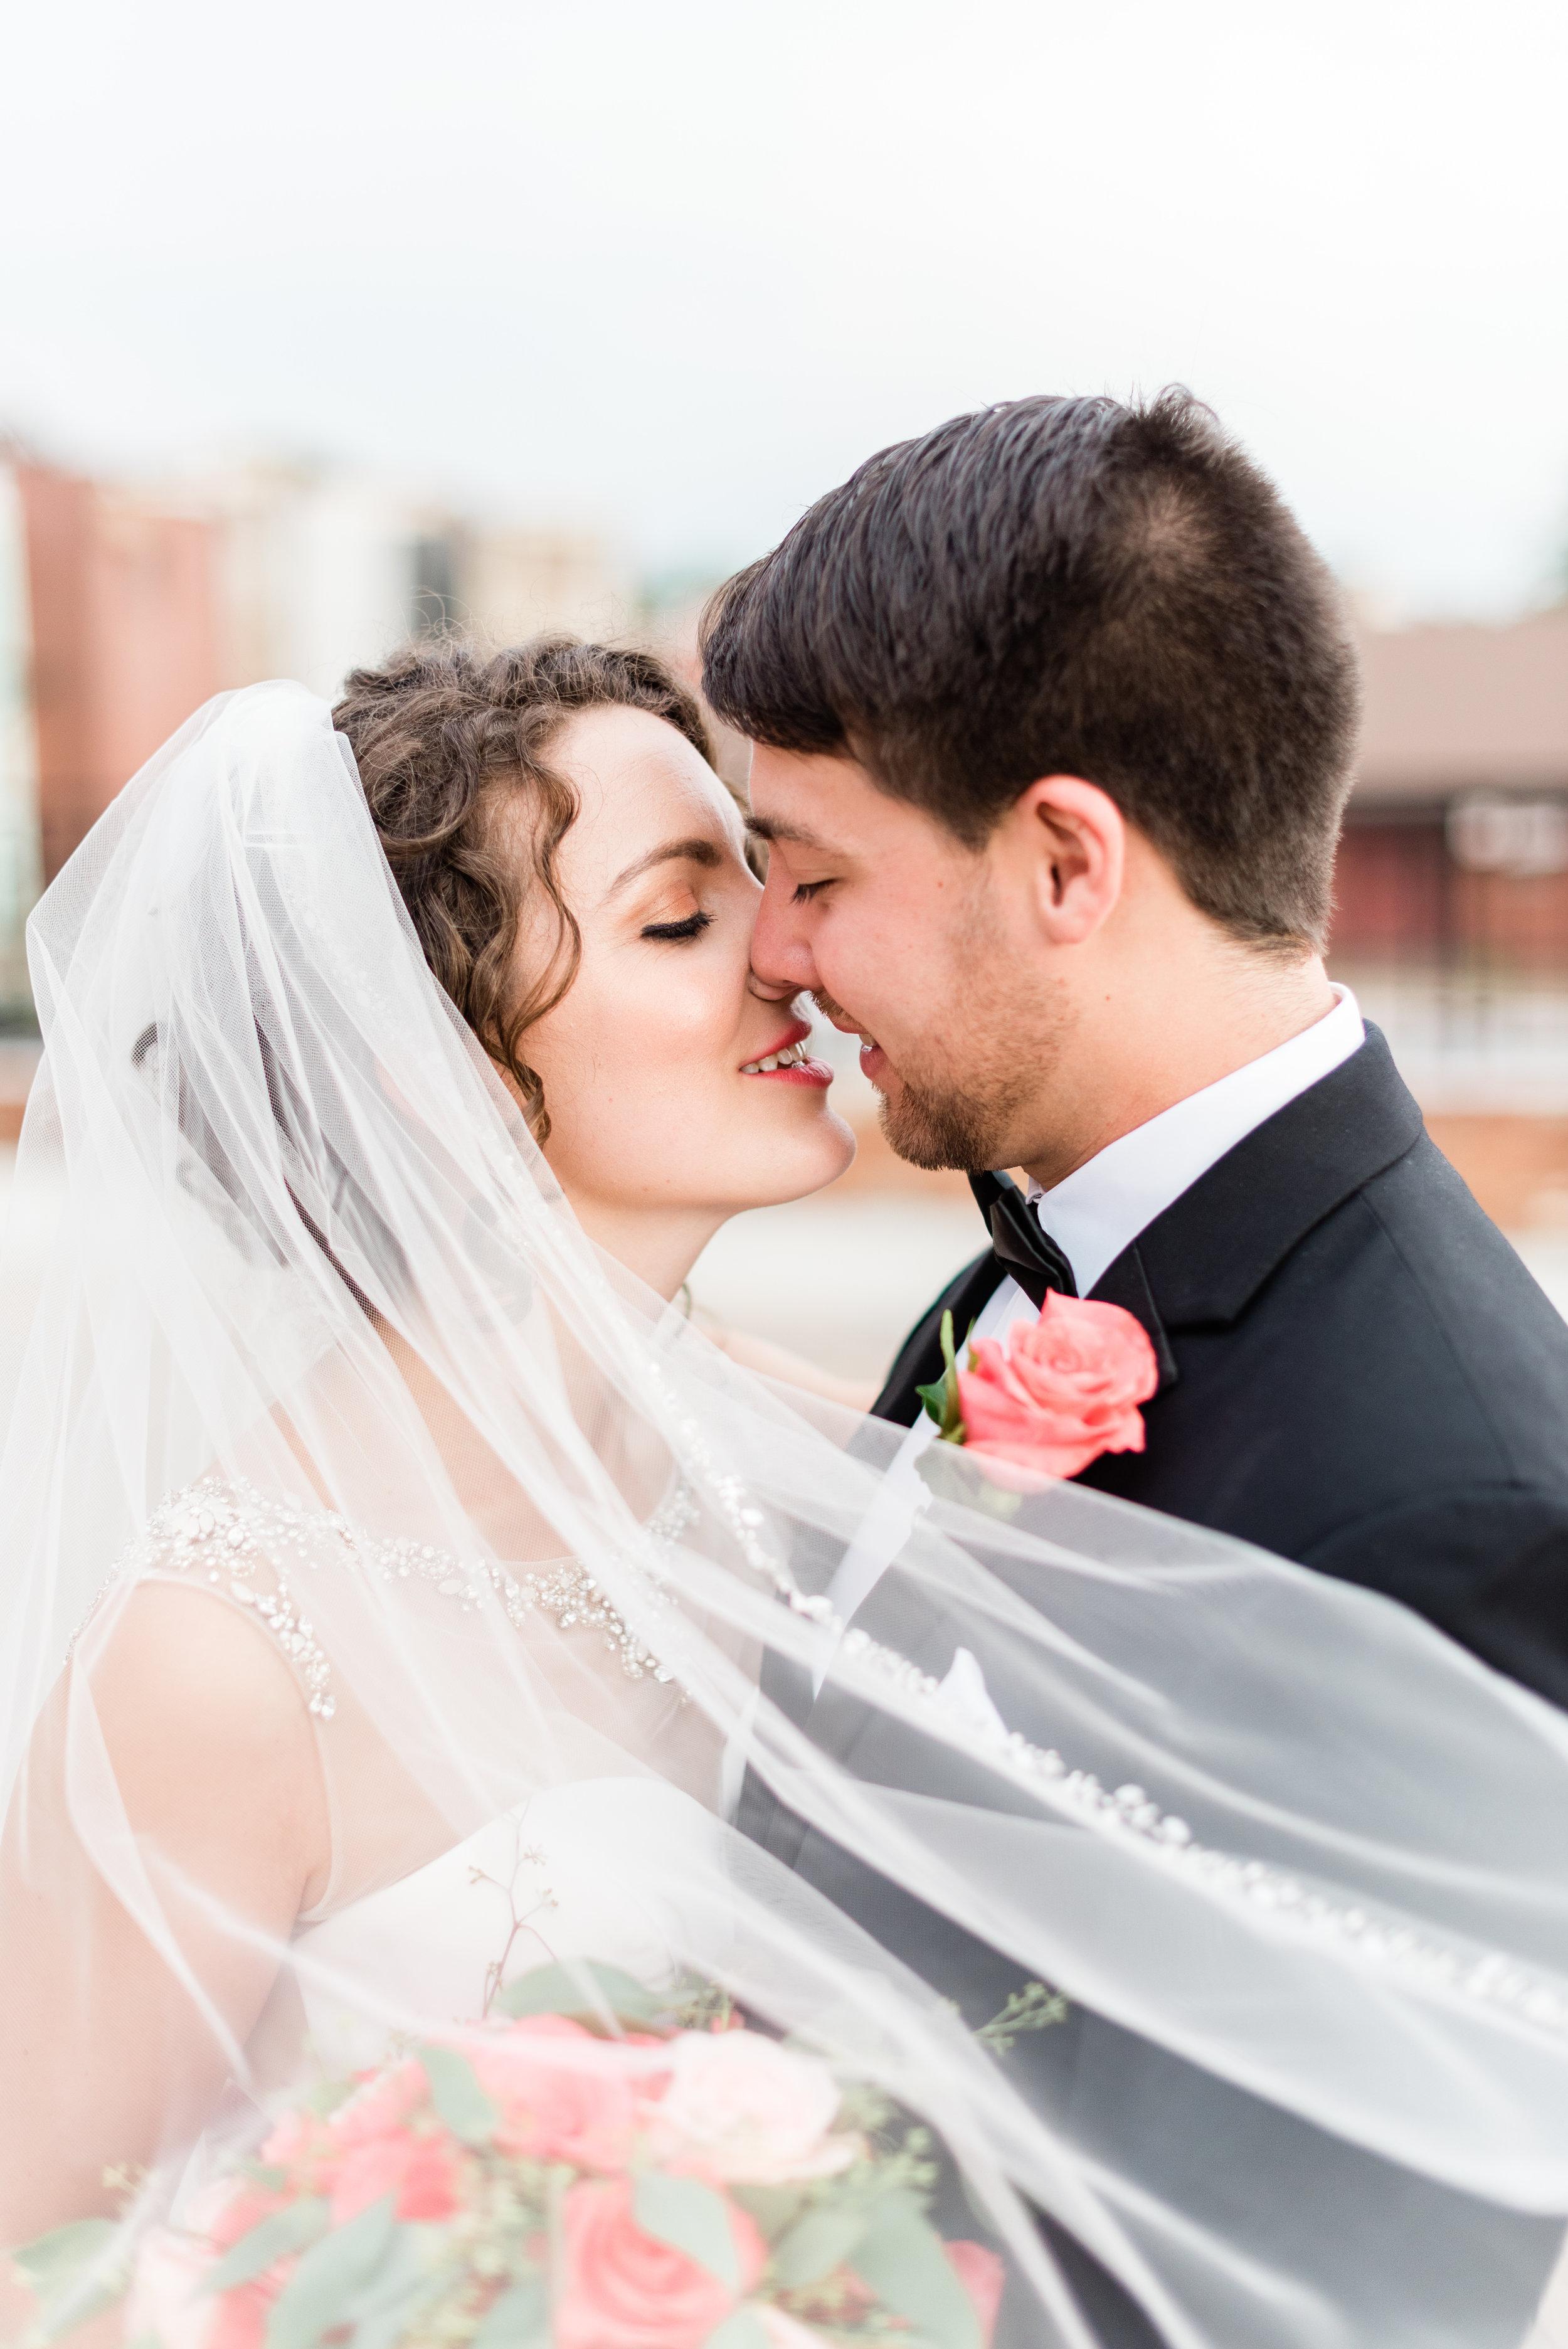 Bleckley Station Wedding 2018-2.jpg